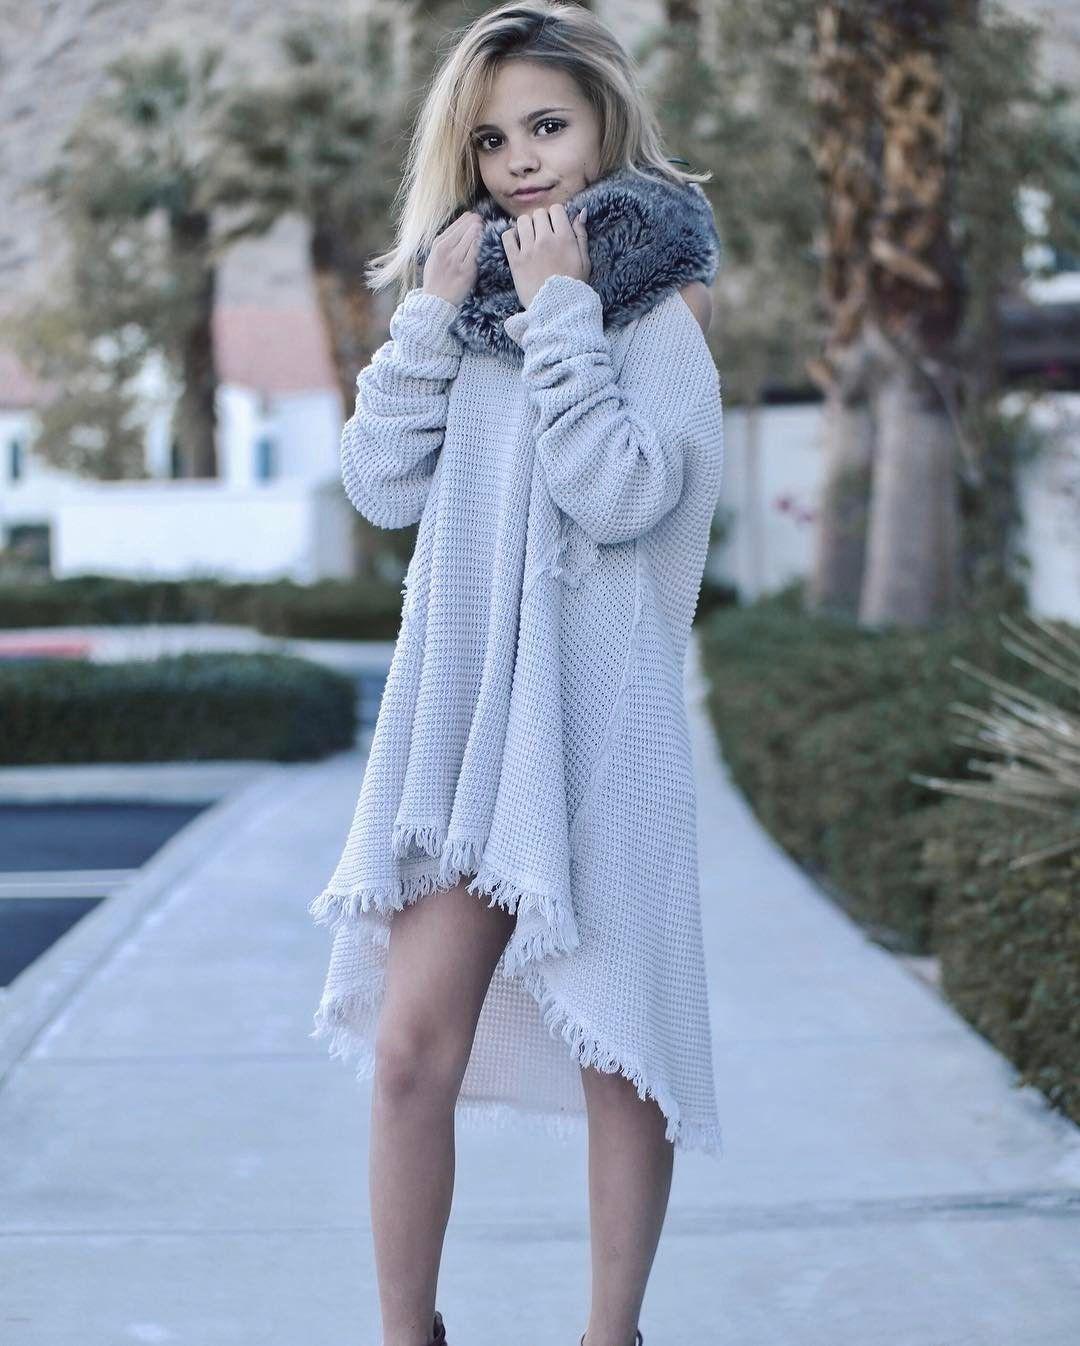 Мagazine Fashion 17 Only Sweet Girls: Pin On Fancy Spring Fashion